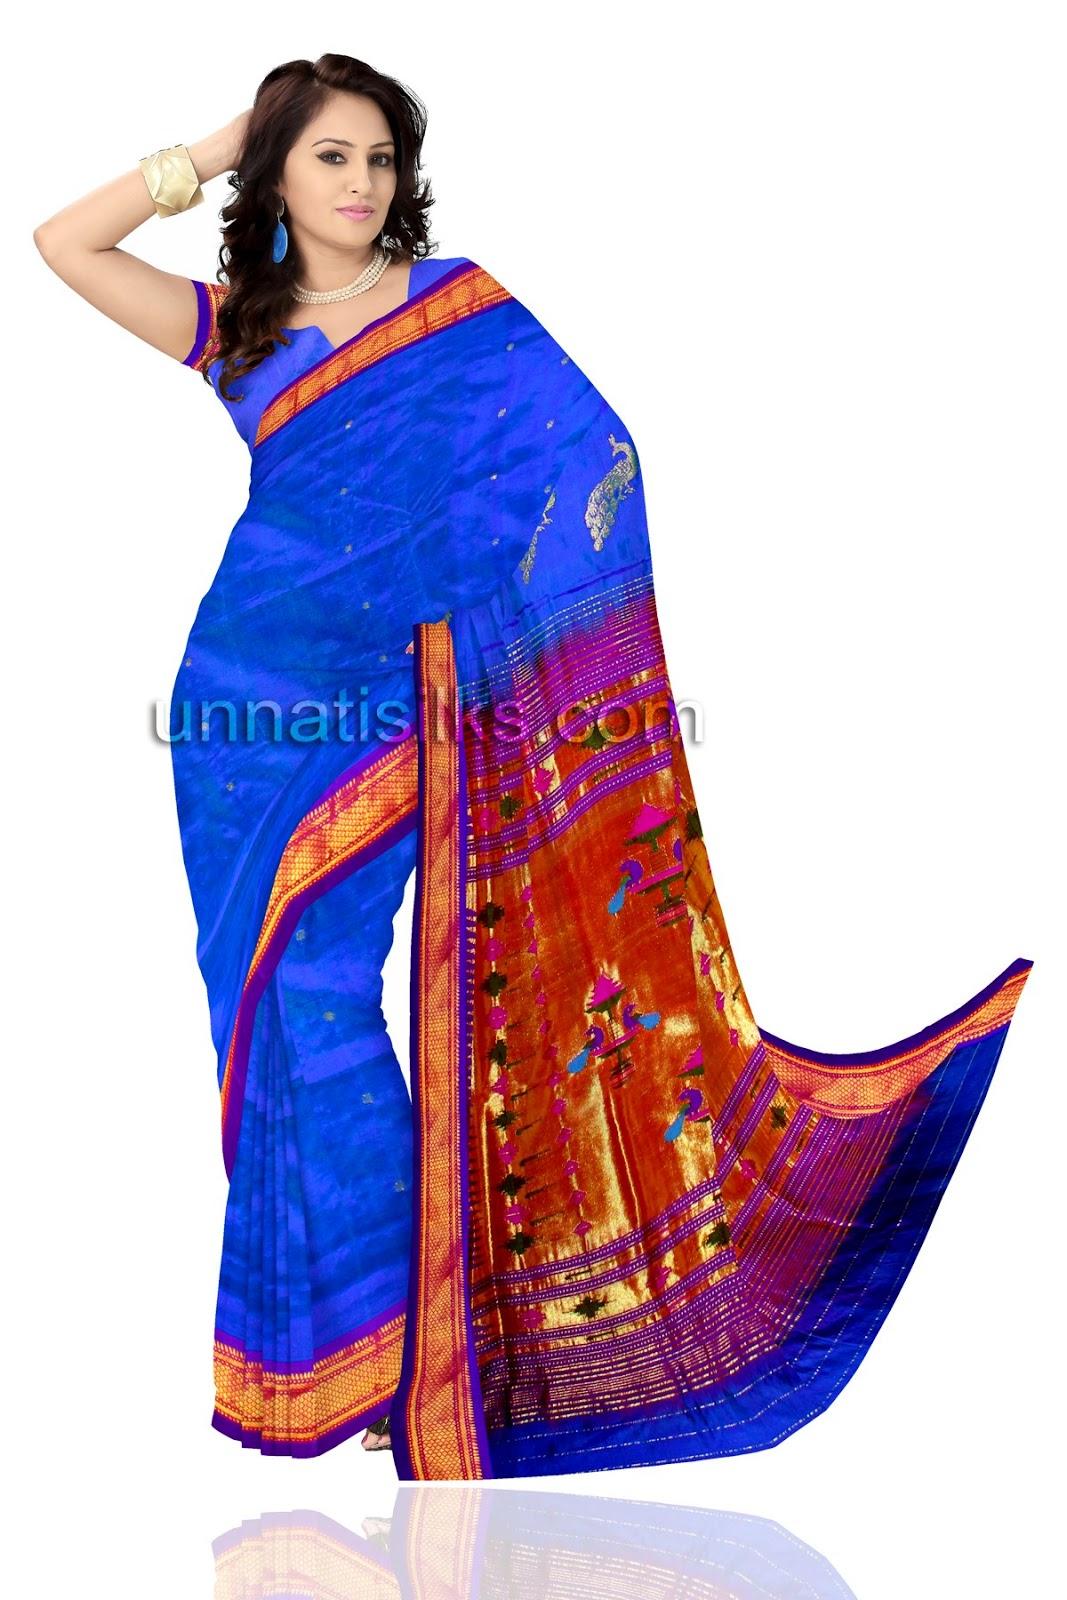 traditional saree weaving in betgeri gadag cluster View pramod kakkanavar's professional on variaties of traditional sarees in betgeri been conducted on power loom weaving clusters in betgeri (dtgadag.